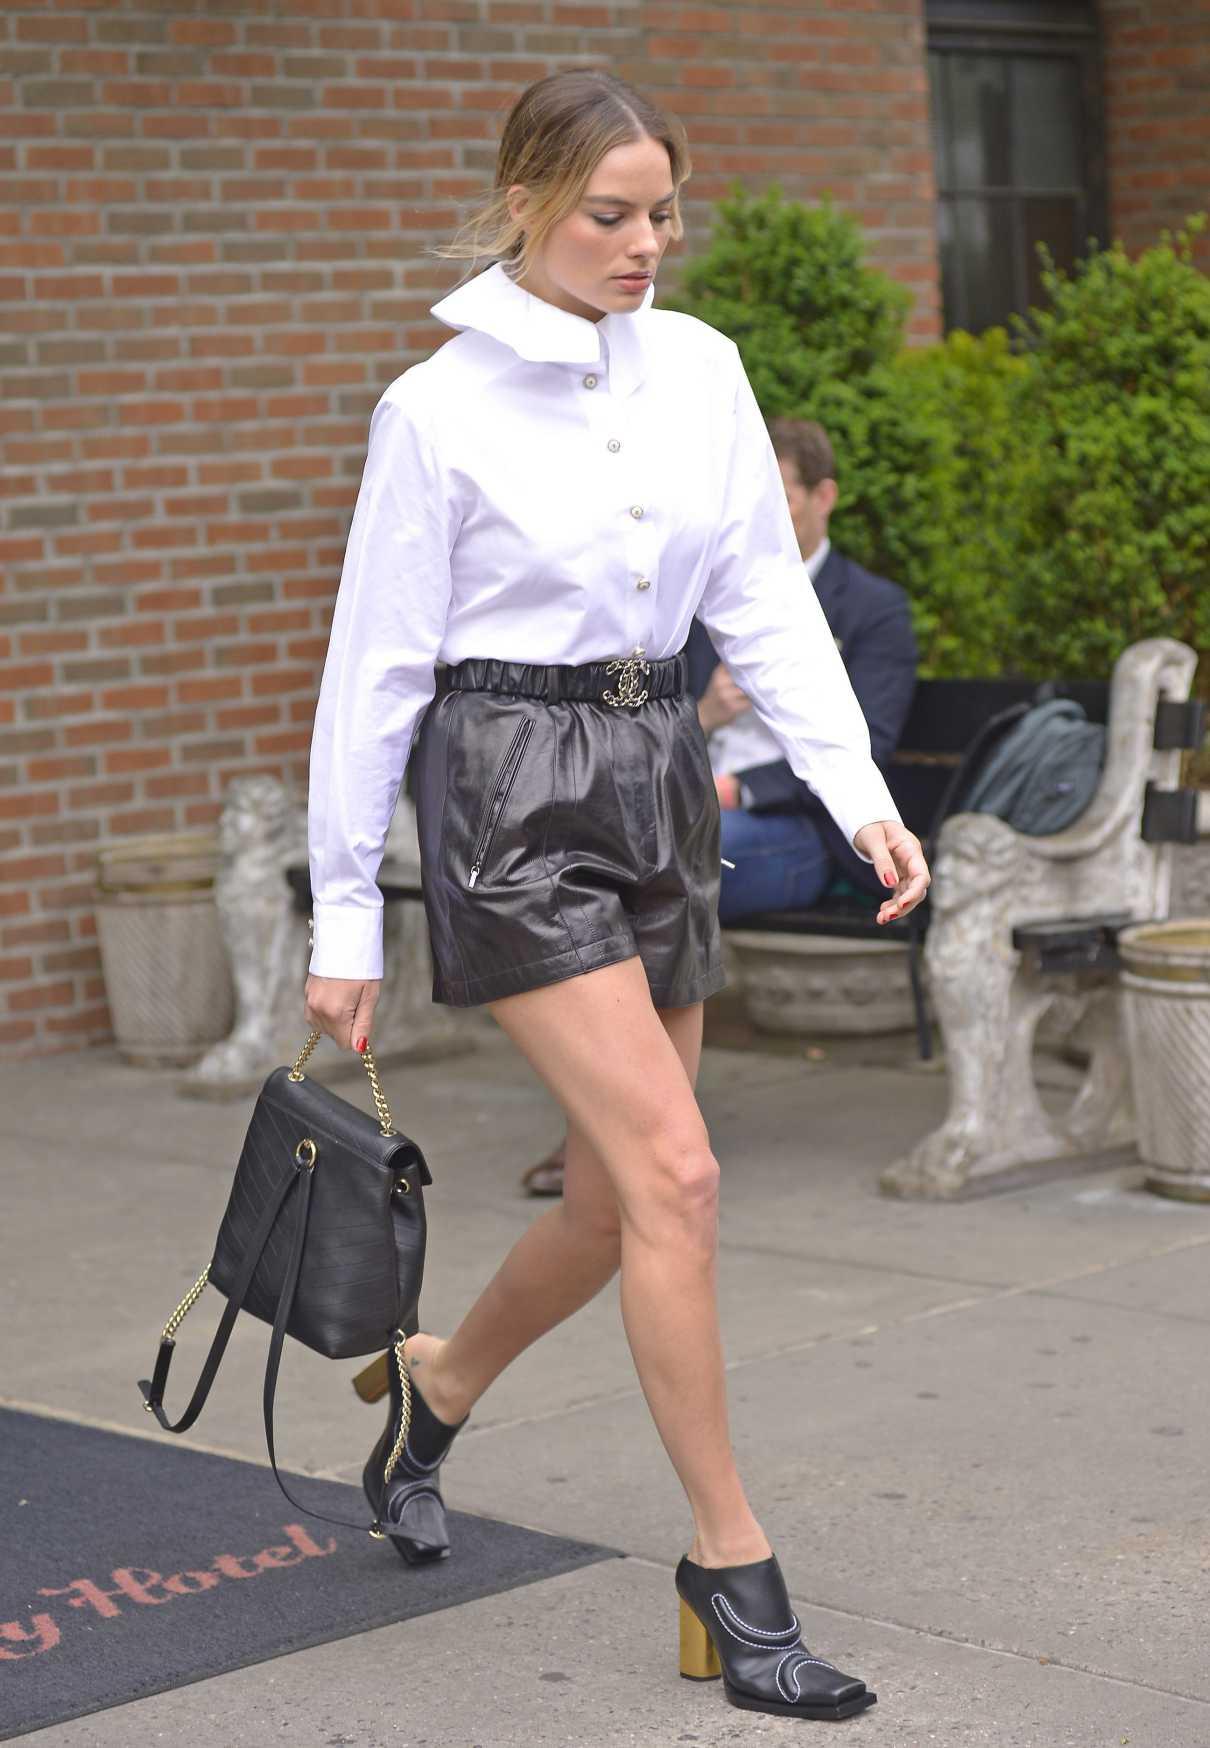 Margot Robbie in a White Blouse